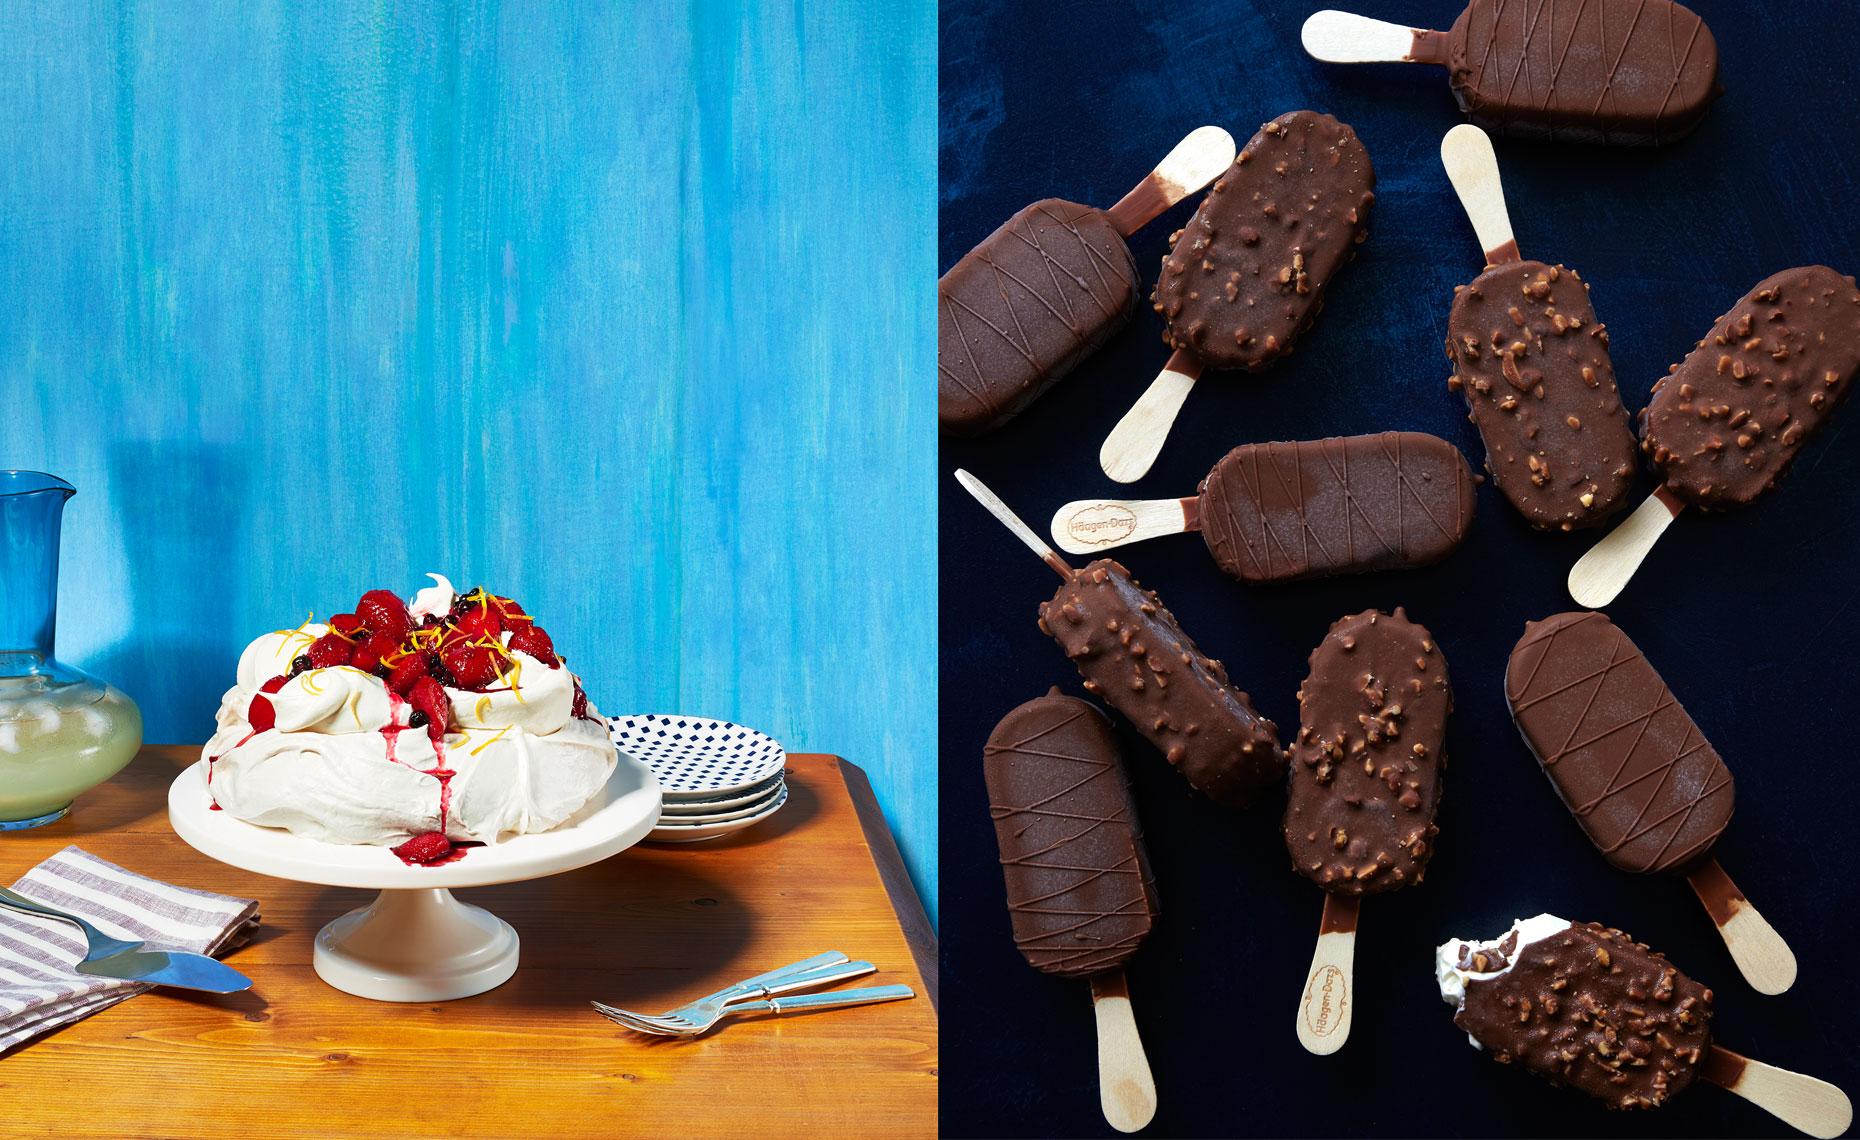 pavlova-and-ice-cream-bars.jpg